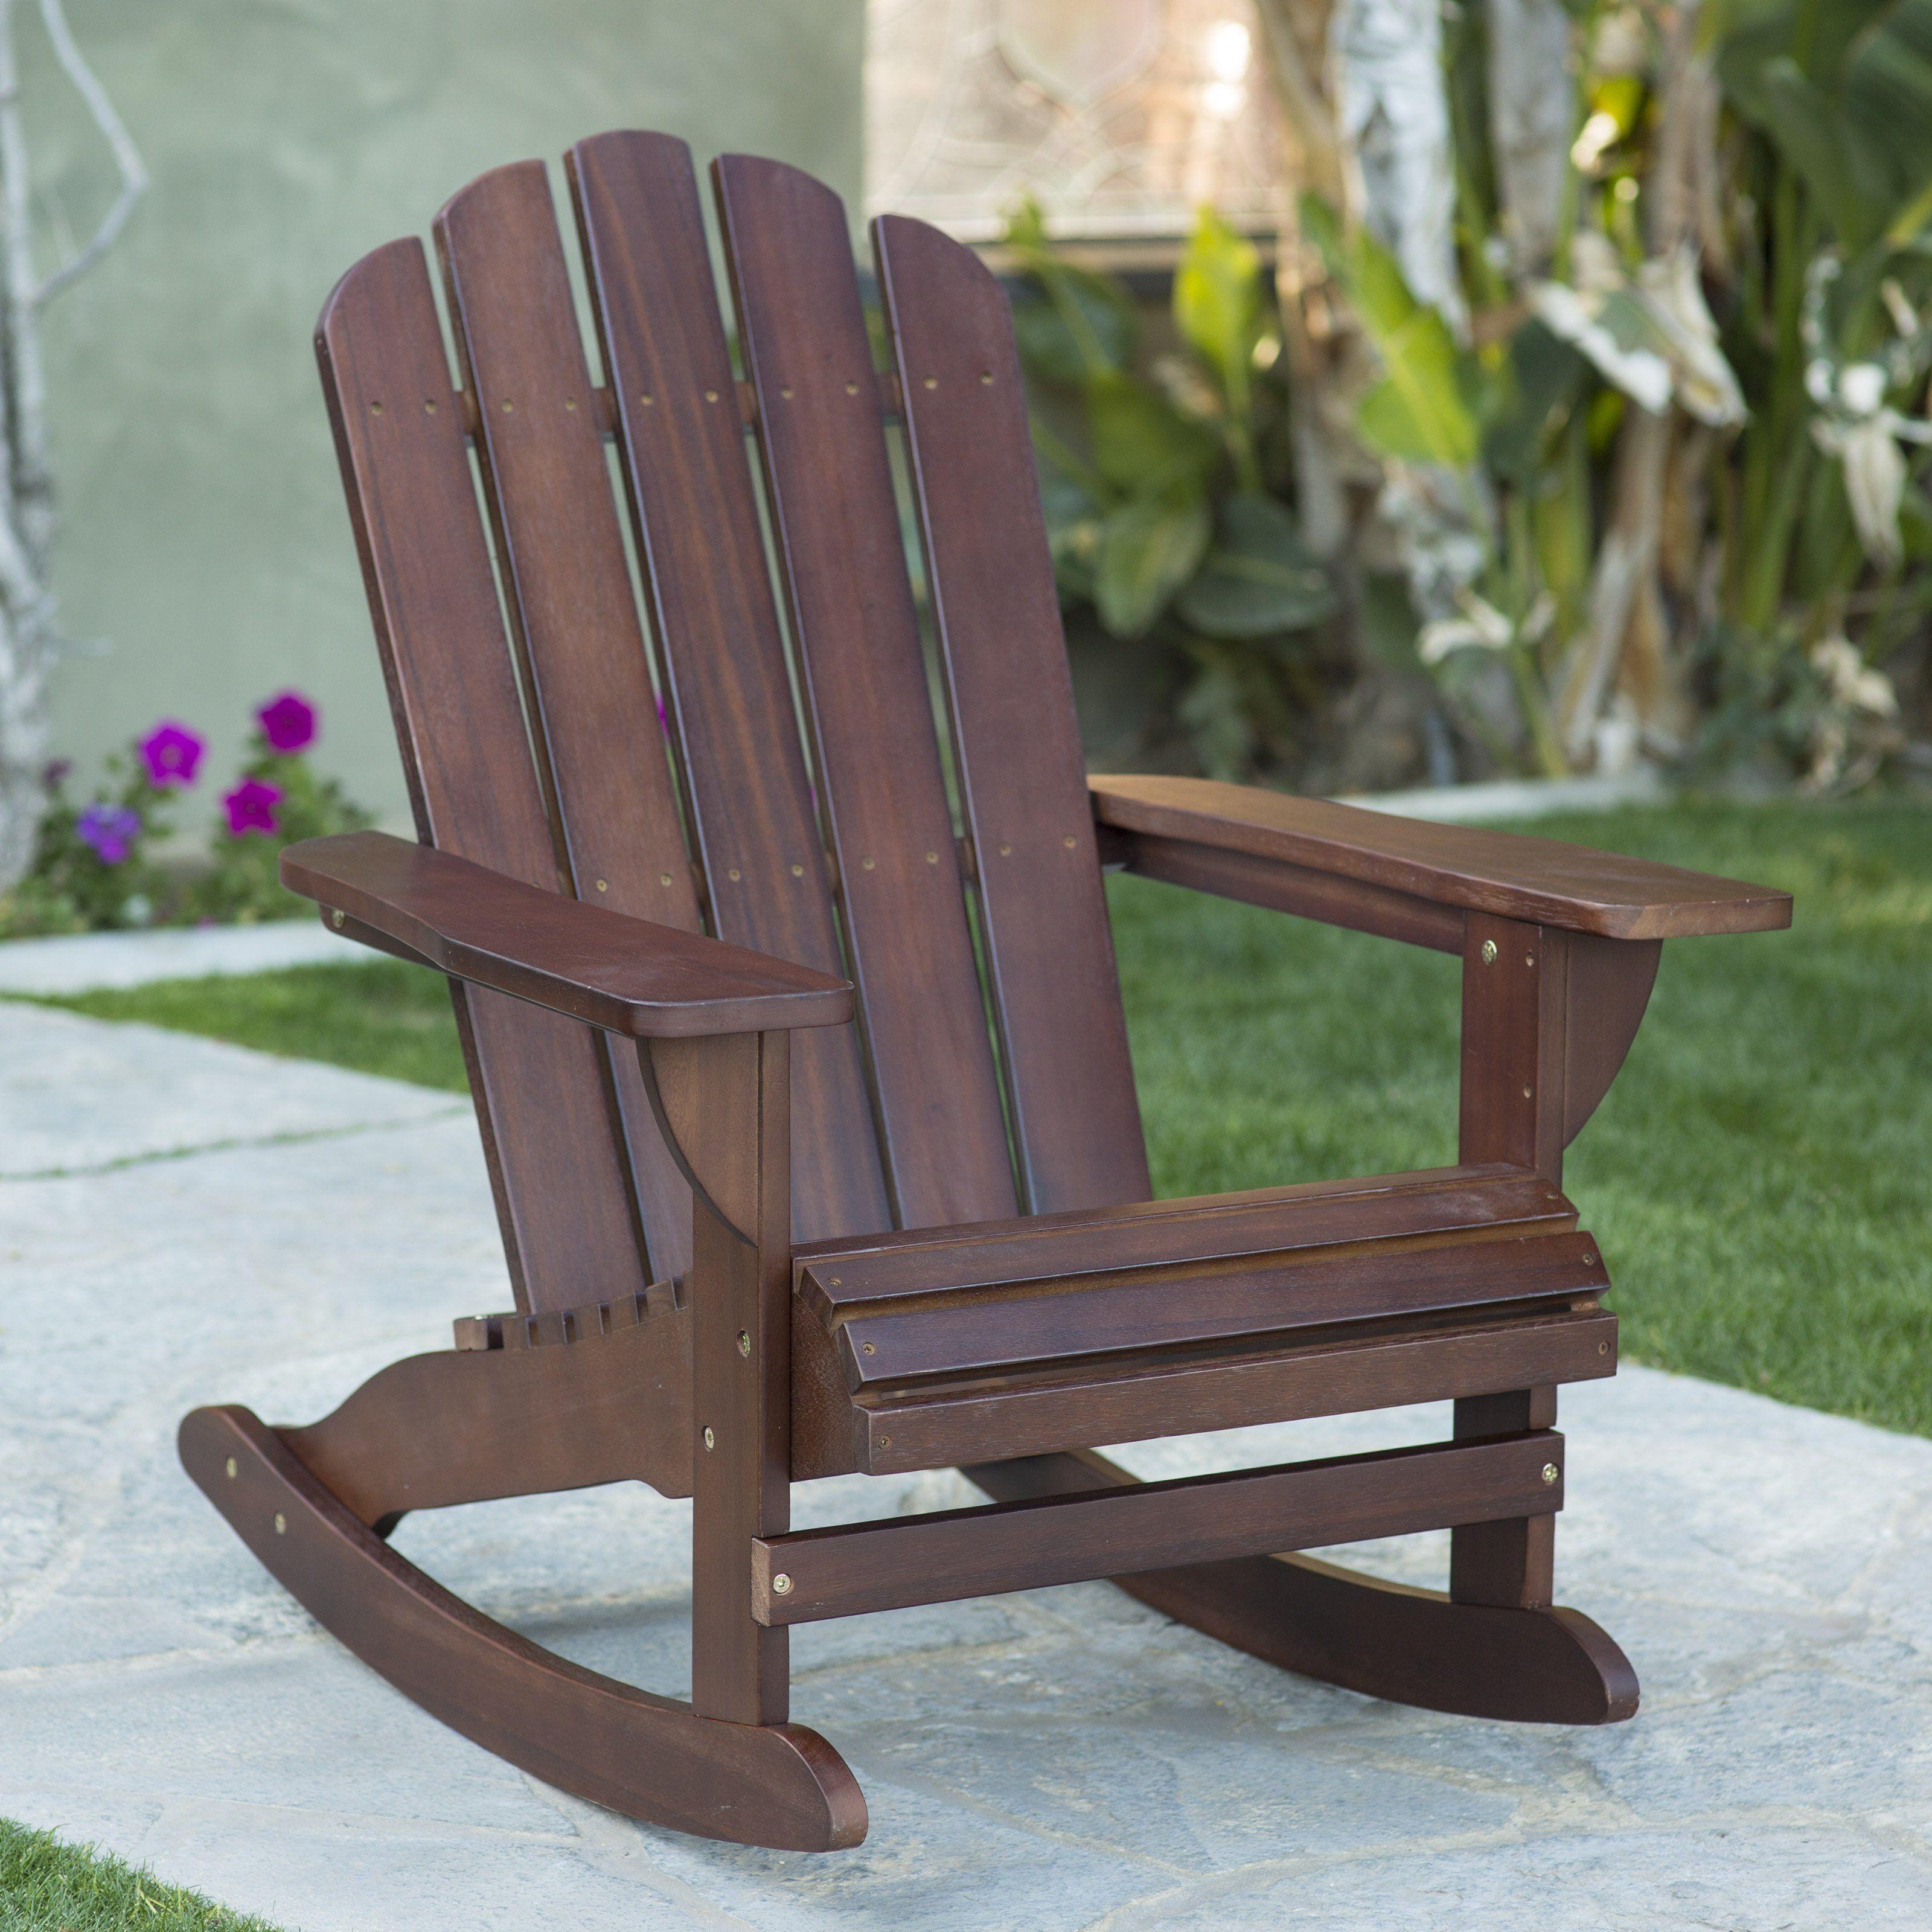 Belham Living Shoreline Adirondack Rocker Chestnut Brown Www Hayneedle Com Wooden Rocking Chairs Porch Chairs Restoration Hardware Dining Chairs